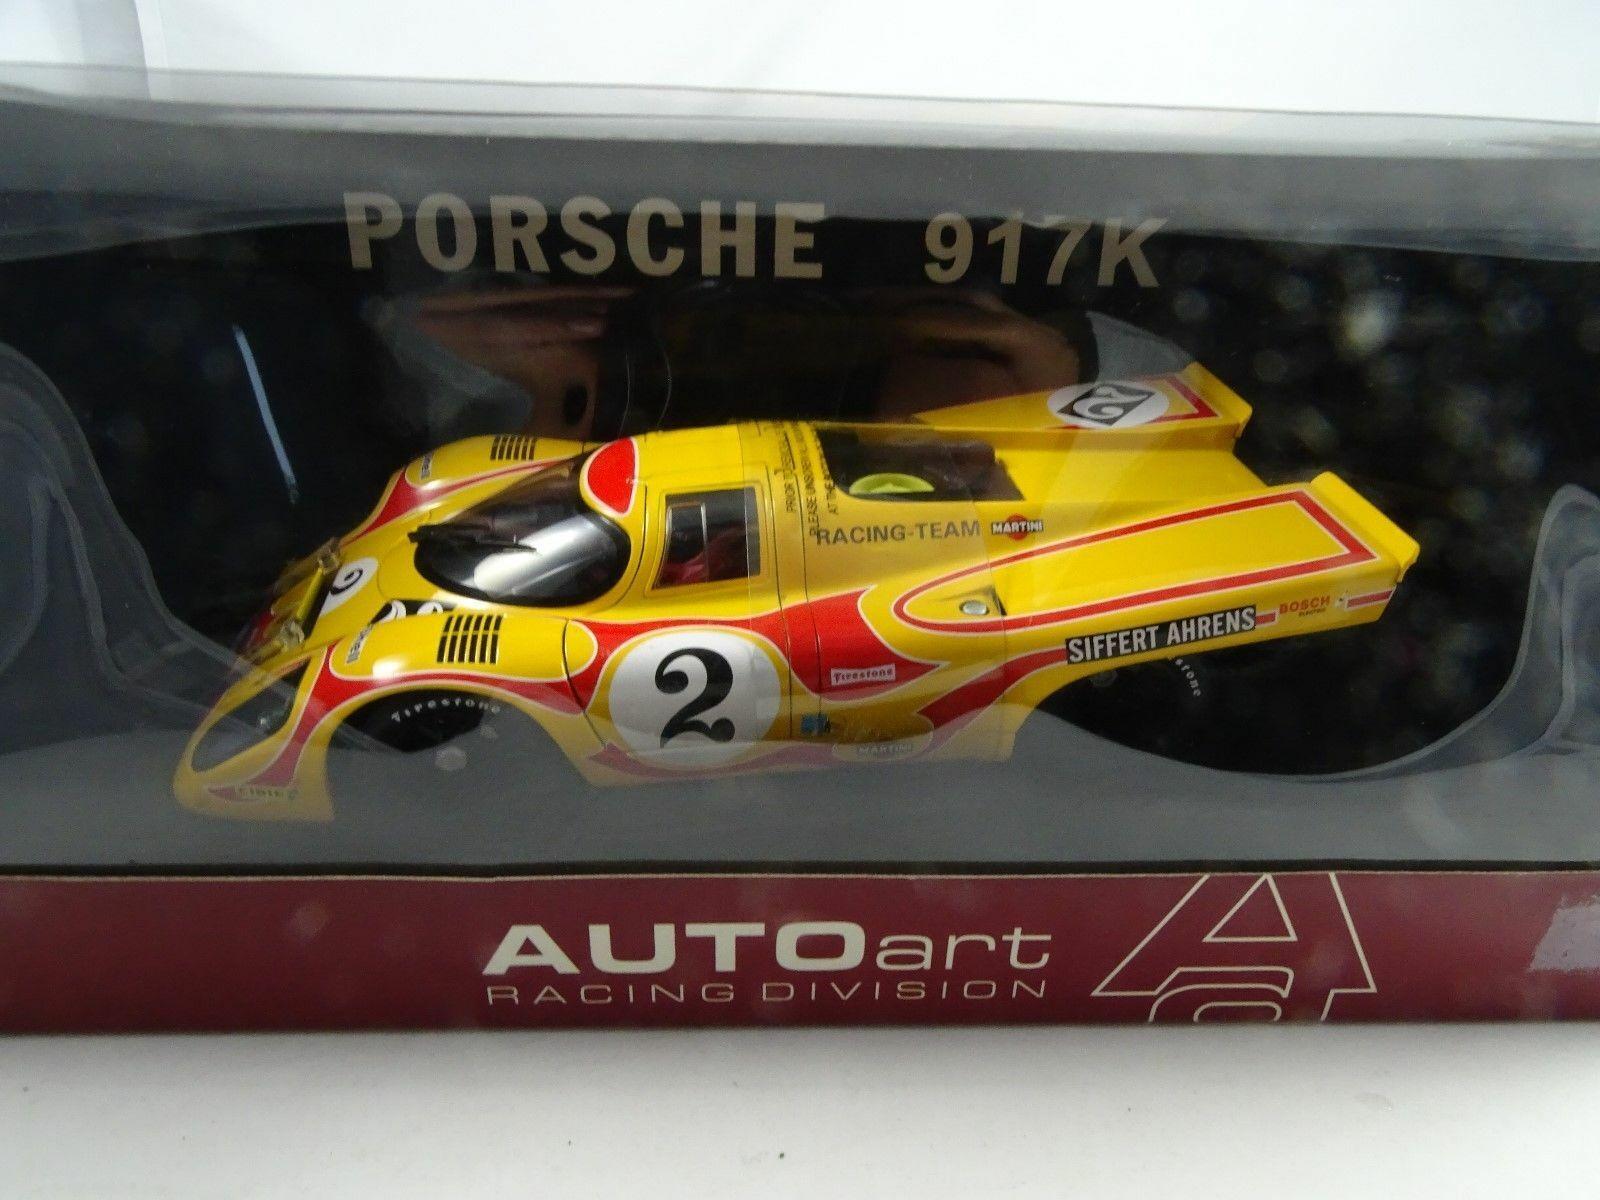 en linea 1 18 18 18 Autoart  80035 Porsche 917K Siffert Ahrens Martini Racing Team  2 Nuevo    tienda en linea